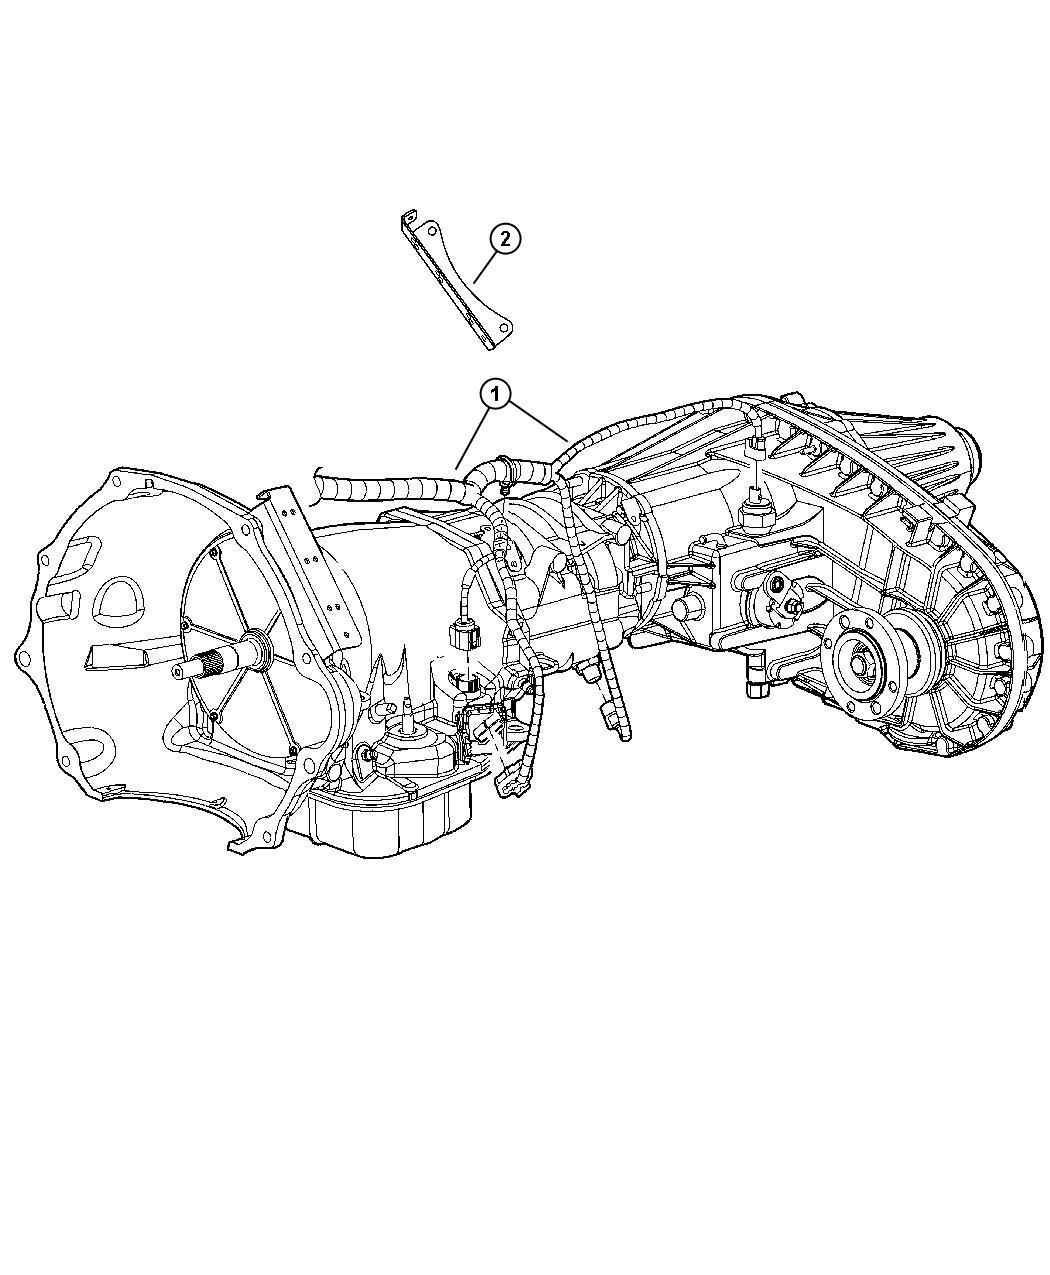 Dodge Ram Wiring Transmission Elec Shift On The